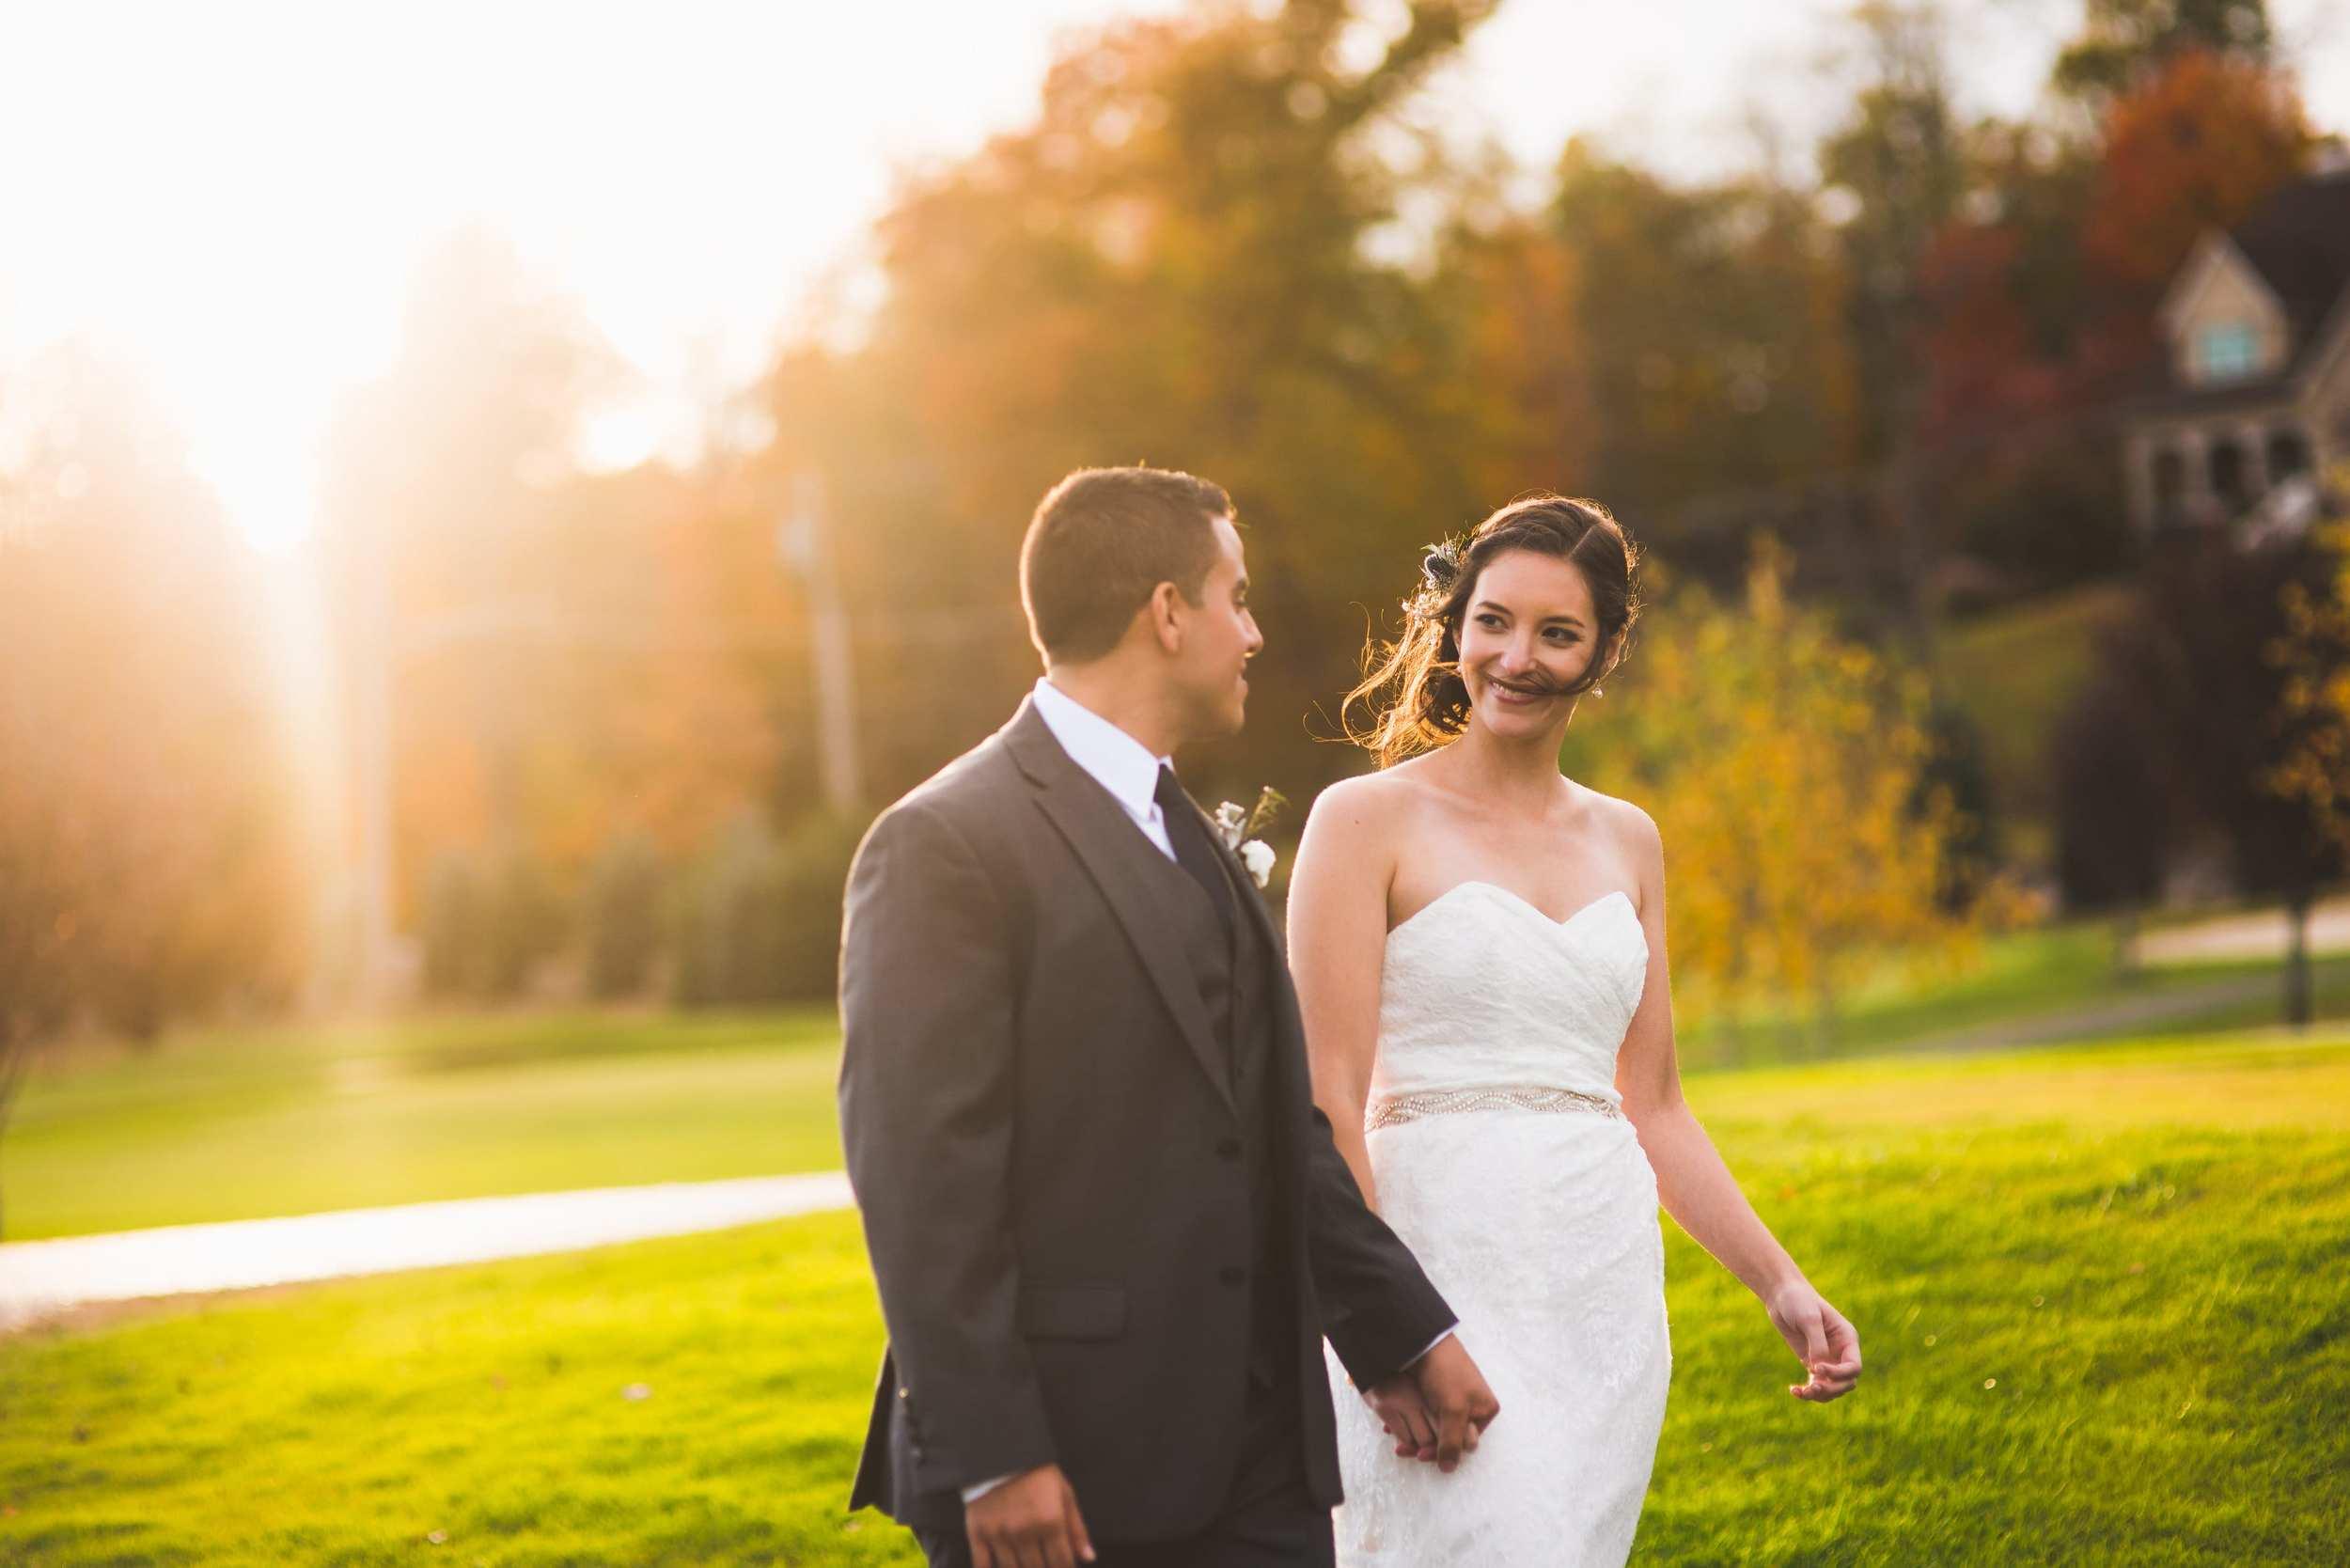 New-York-Wedding-Photographer-Falkirk-Wedding(147of163)-min.jpg